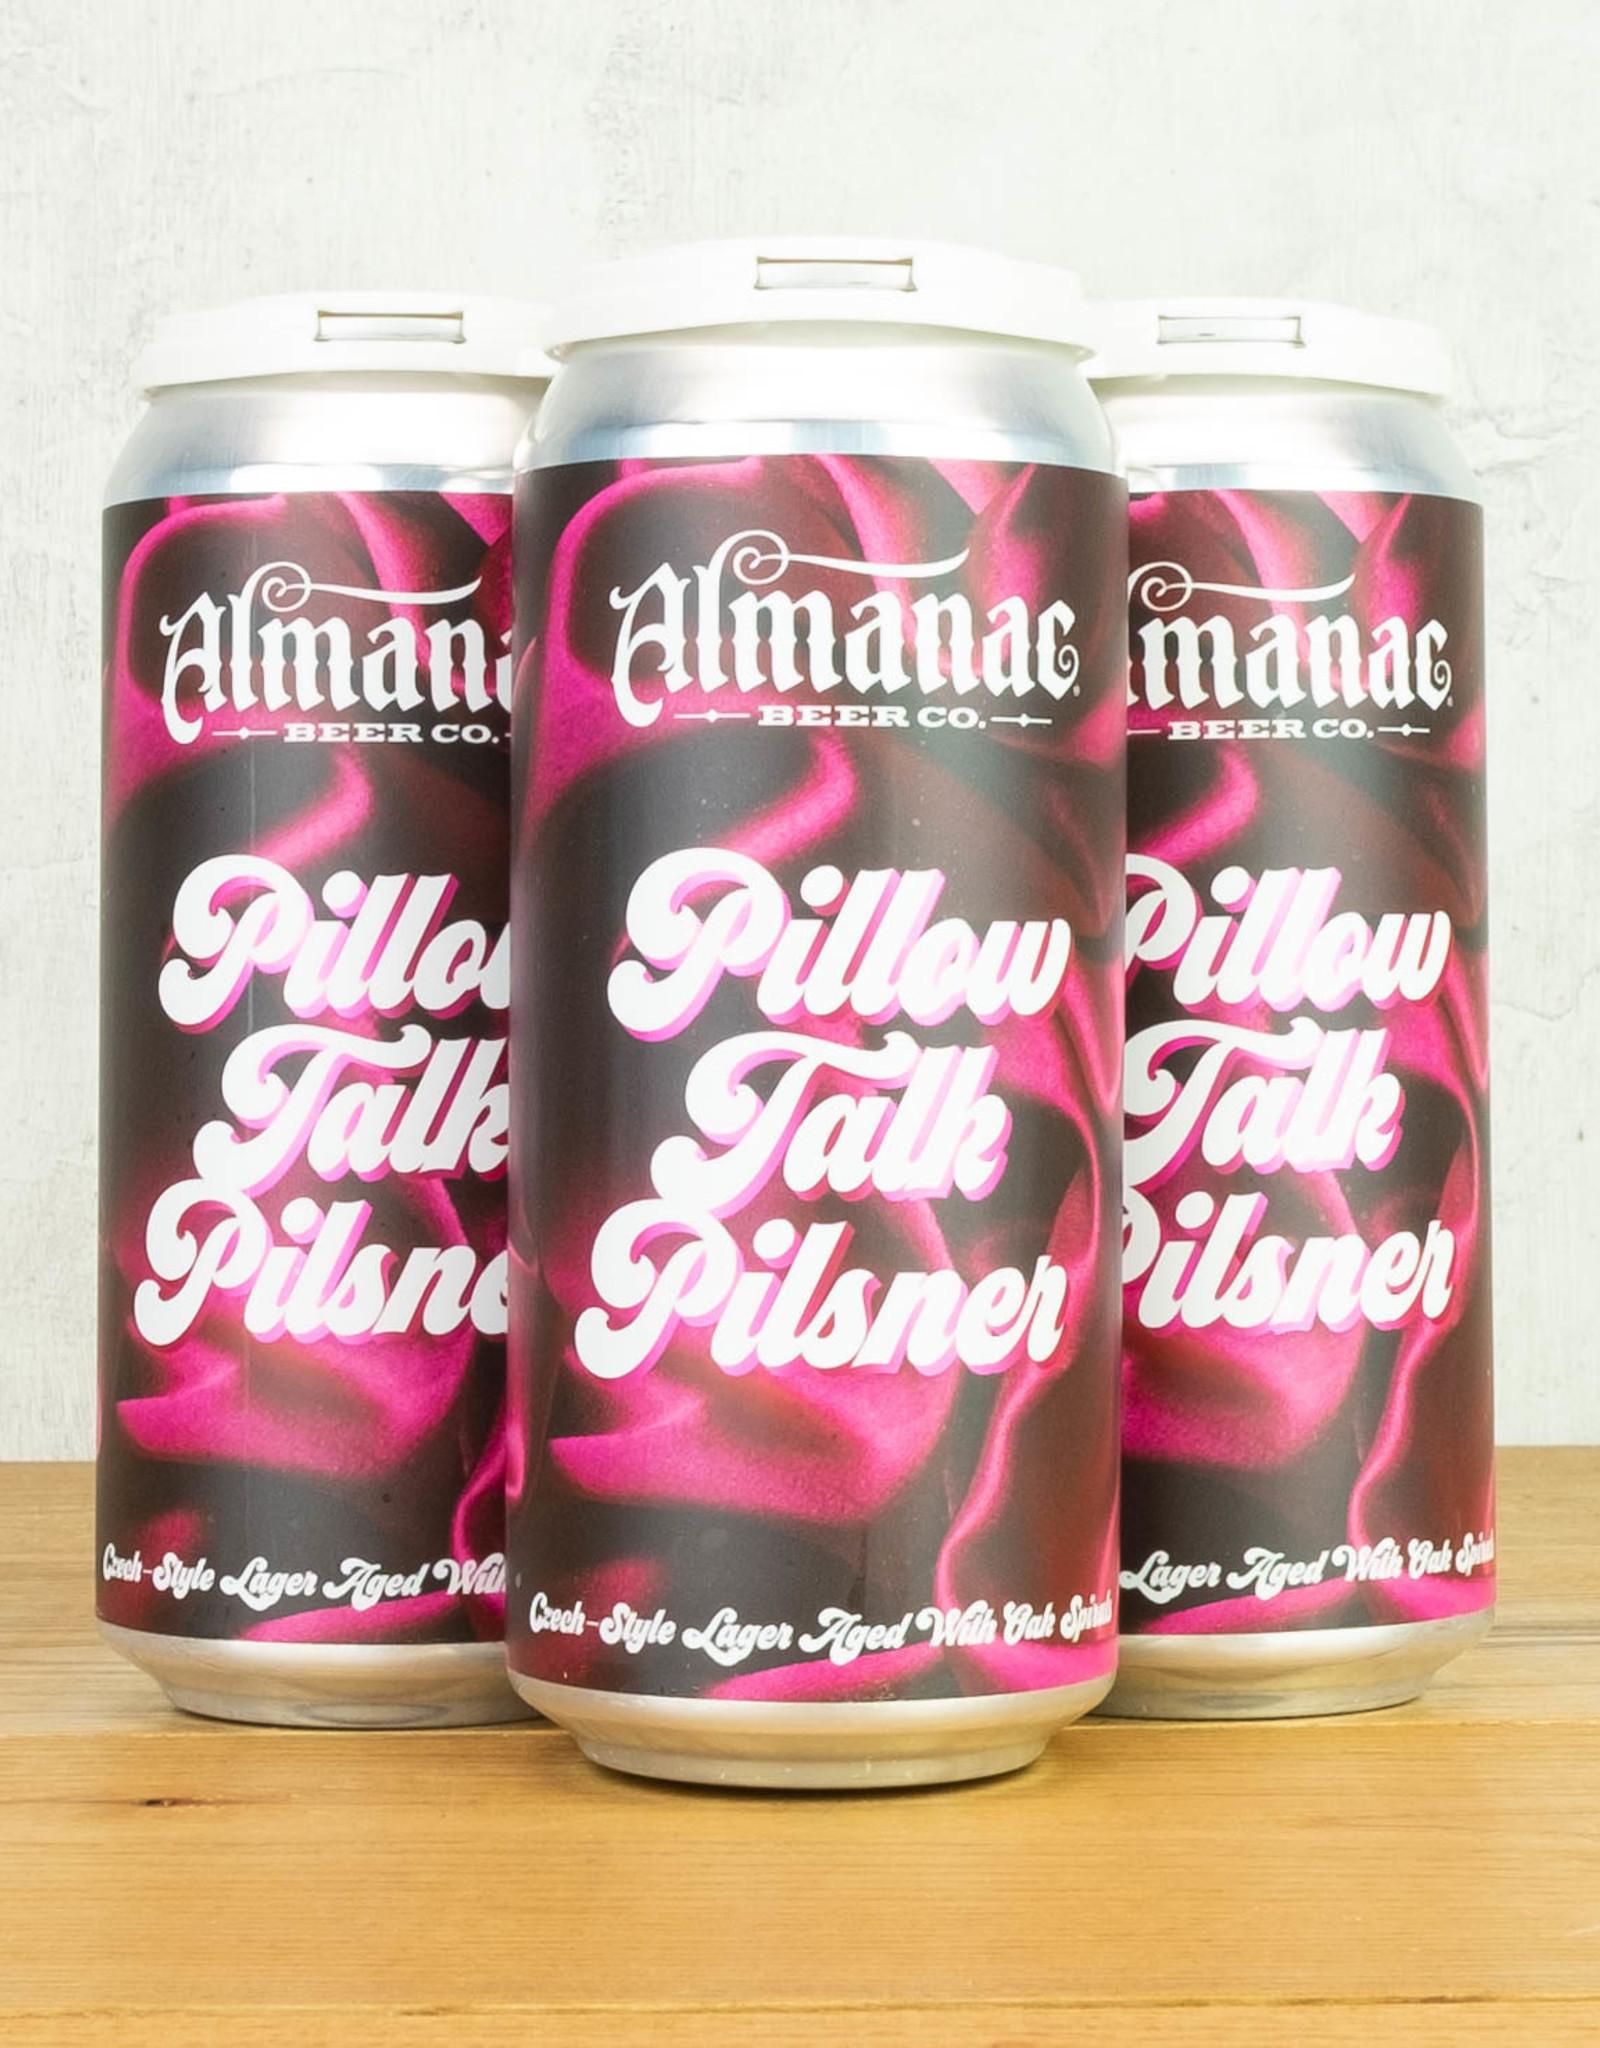 Almanac Beer Co. Pillow Talk Pilsner 4pk